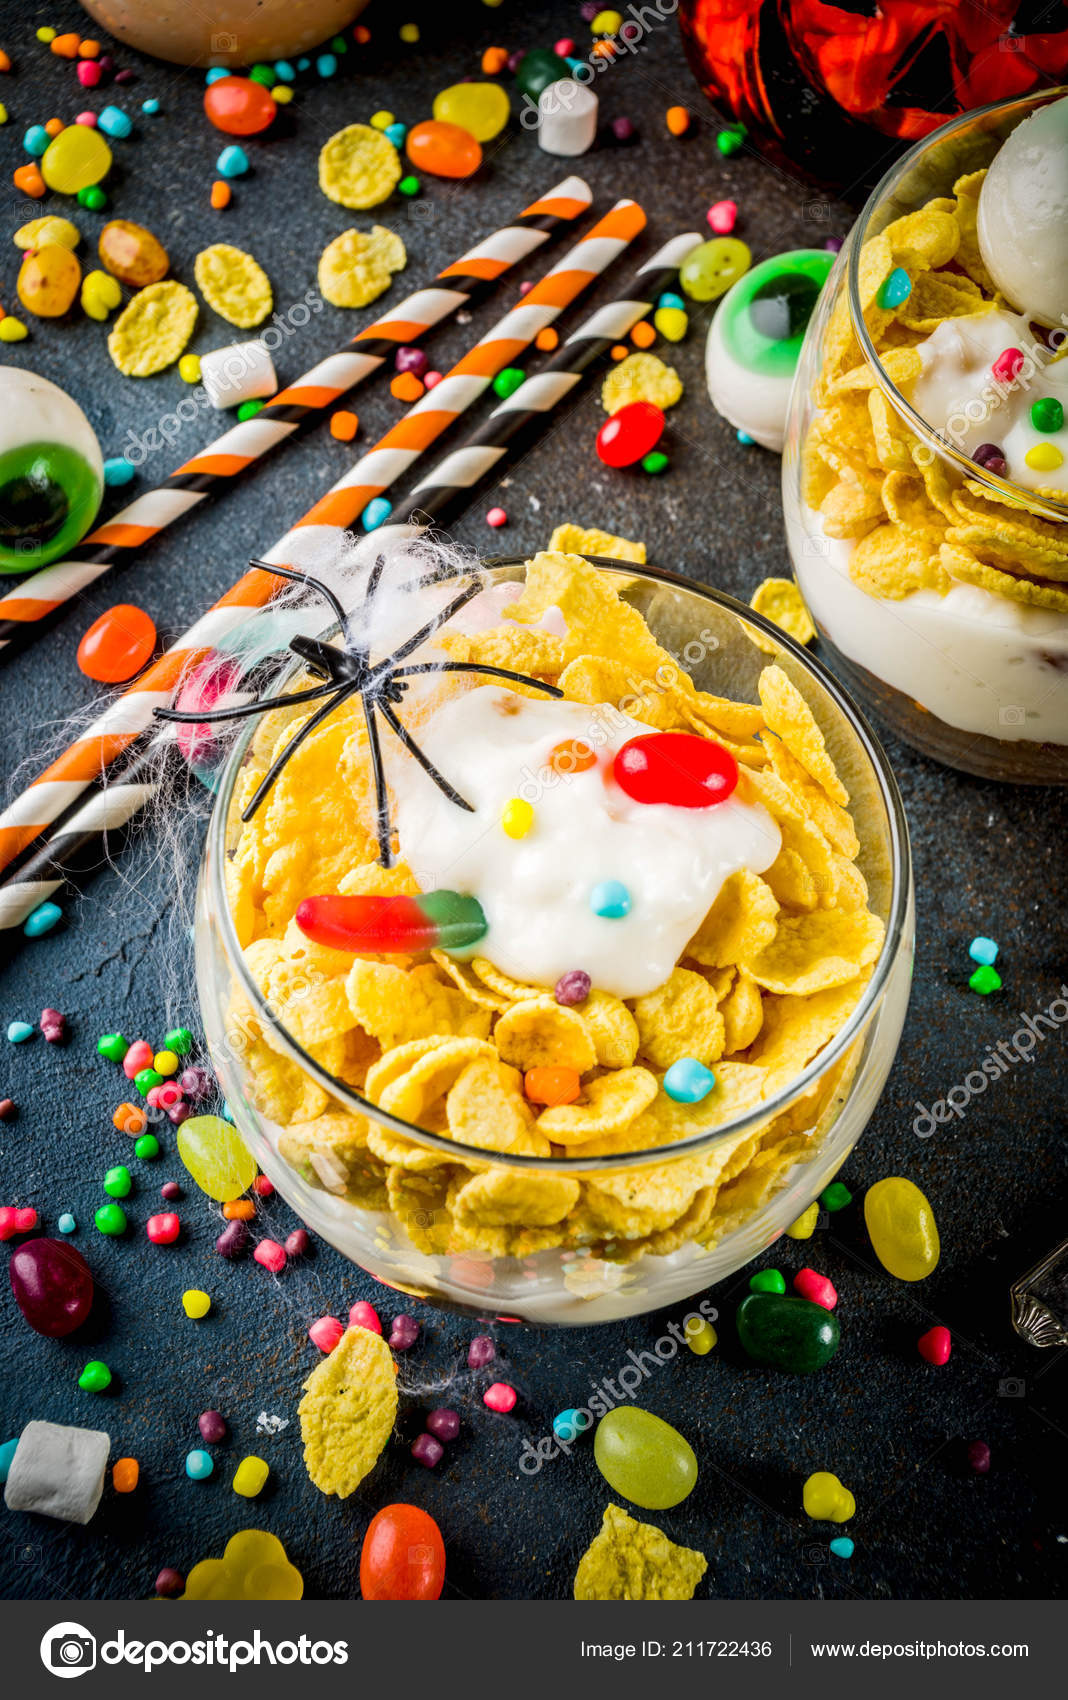 Funny Halloween Food Ideas Trifle Dessert Kids Spooky Halloween Decorations Stock Photo C Unixx 0 Gmail Com 211722436